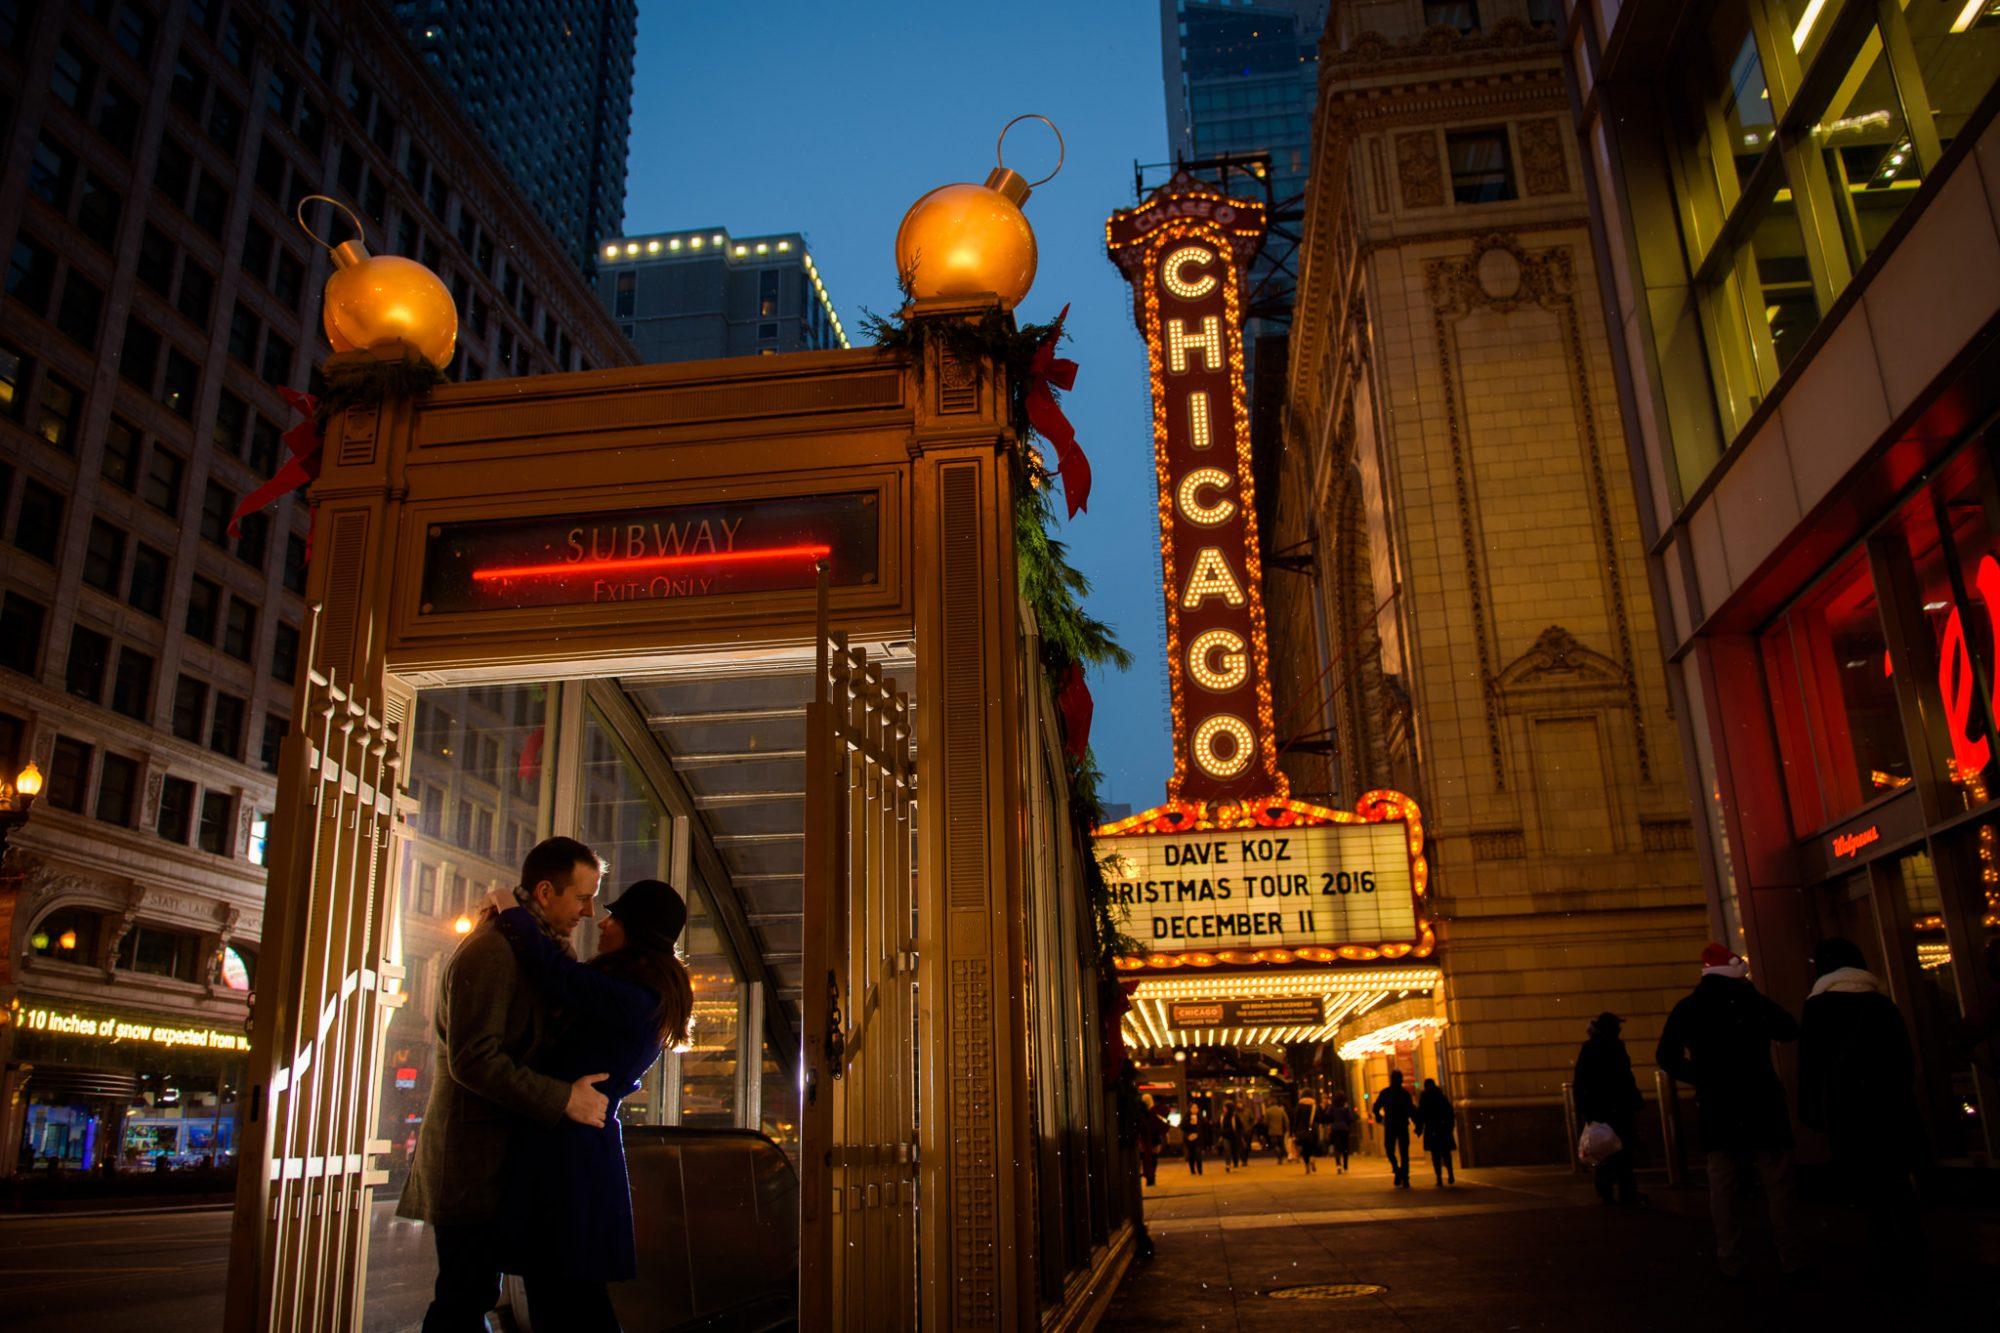 Chicago Engagement Subway Entrance Theatre